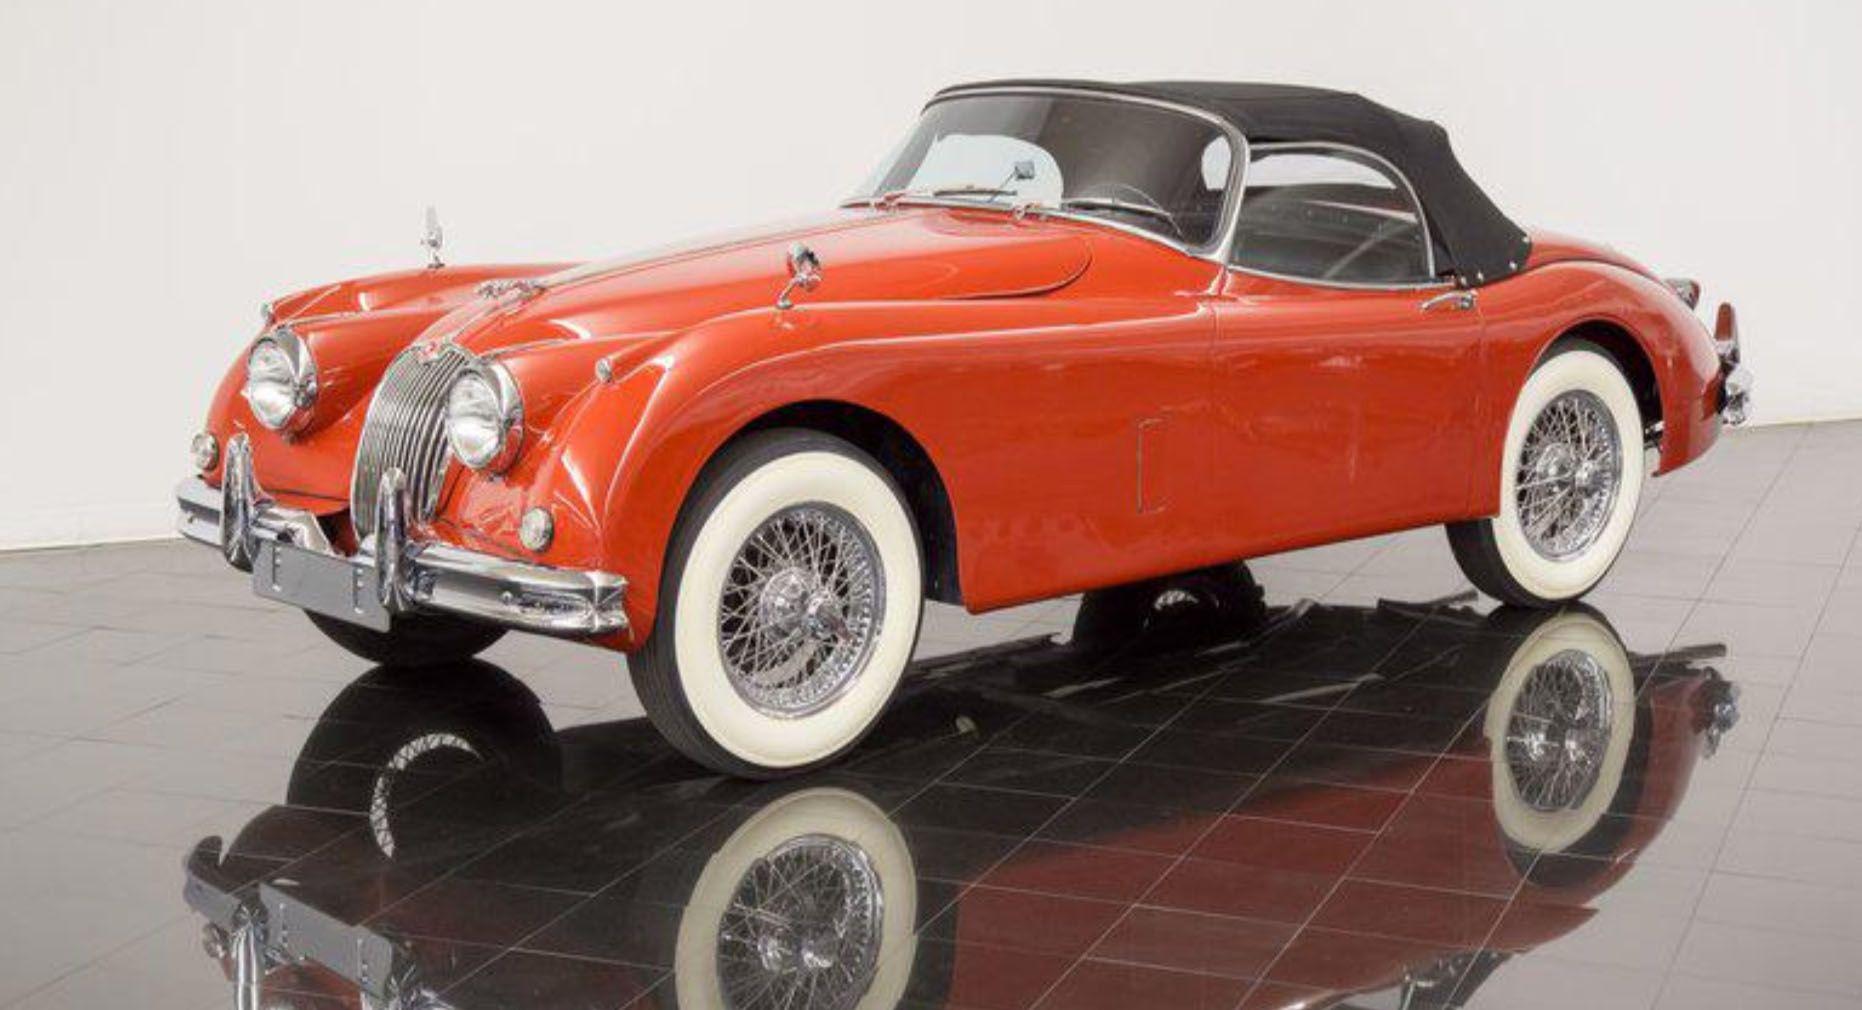 "<img src=""1959-jaguar-xk150.jpg"" alt=""A pristine 1959 Jaguar XK150 SE Roadster in Carmen Red"">"